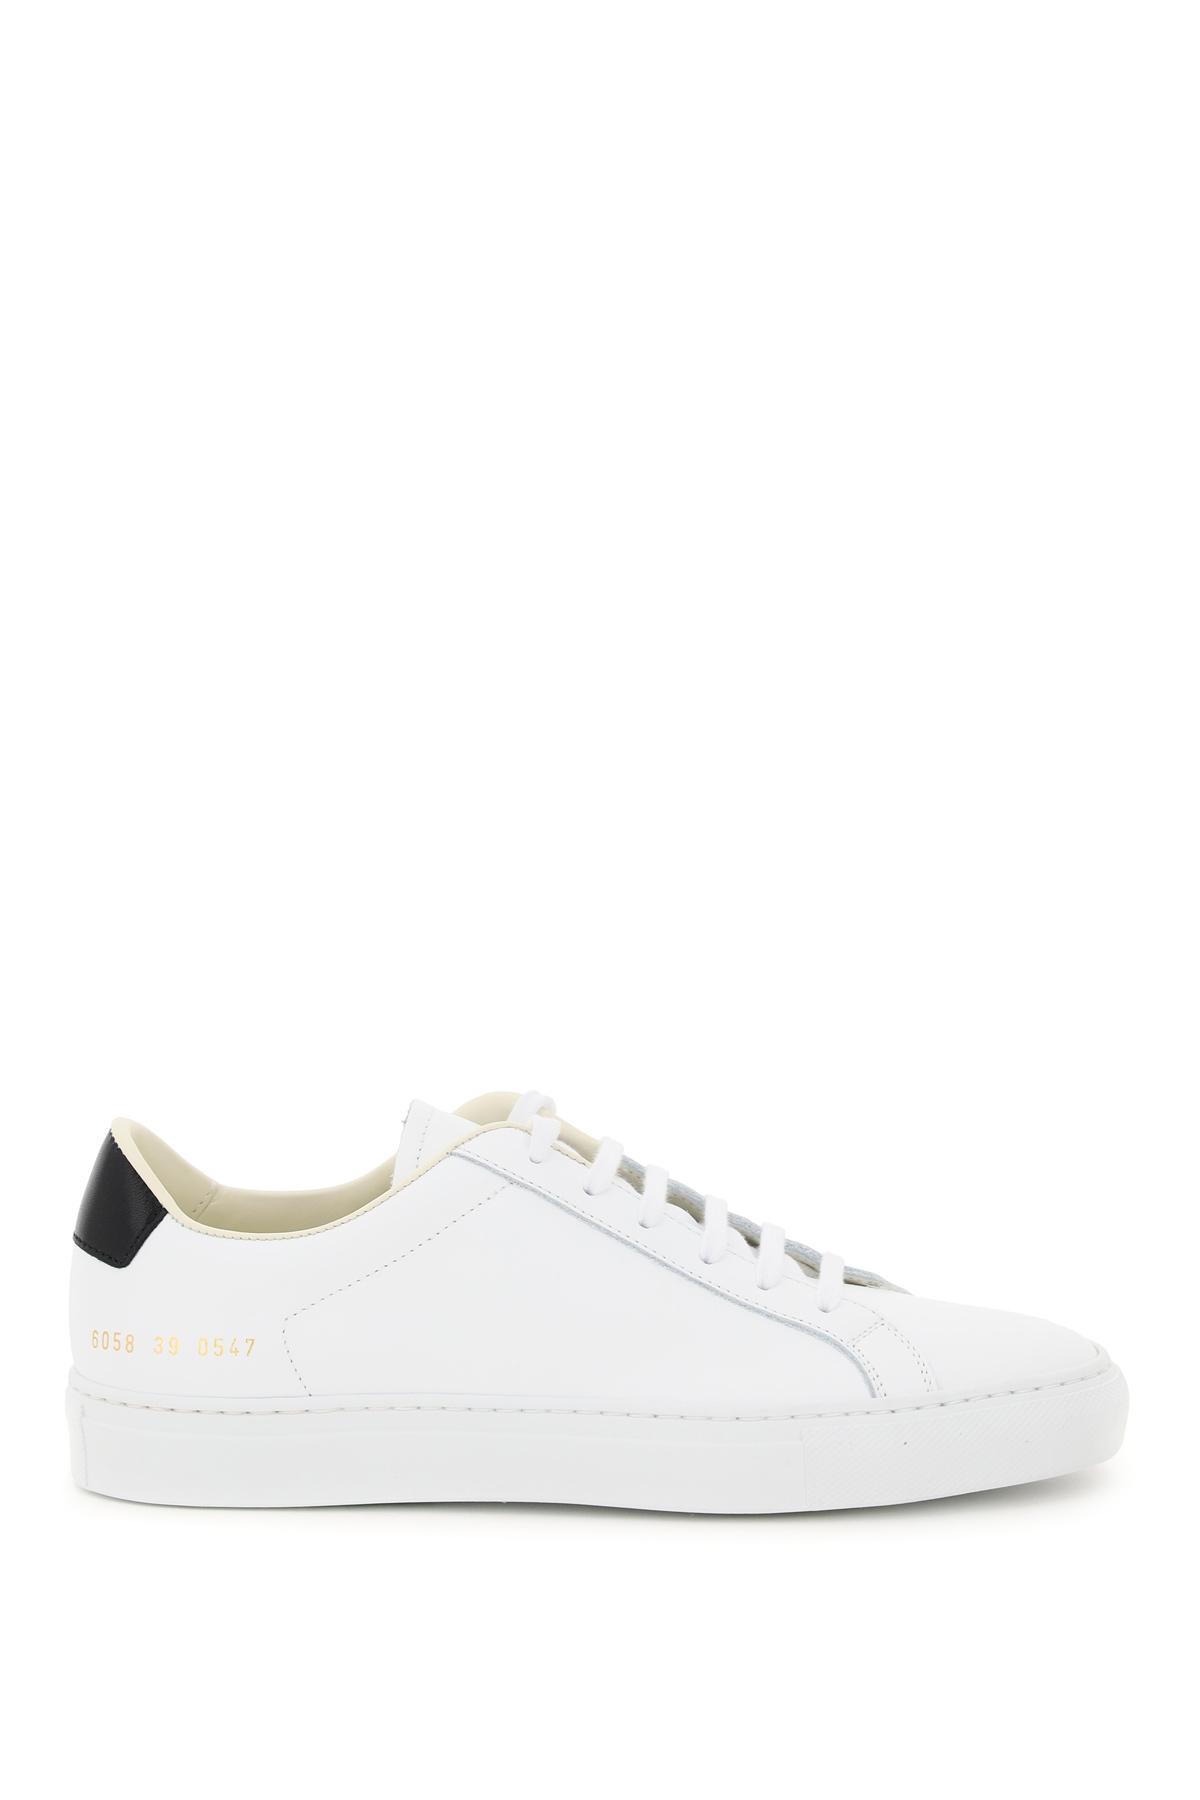 Common projects sneaker in pelle retro low